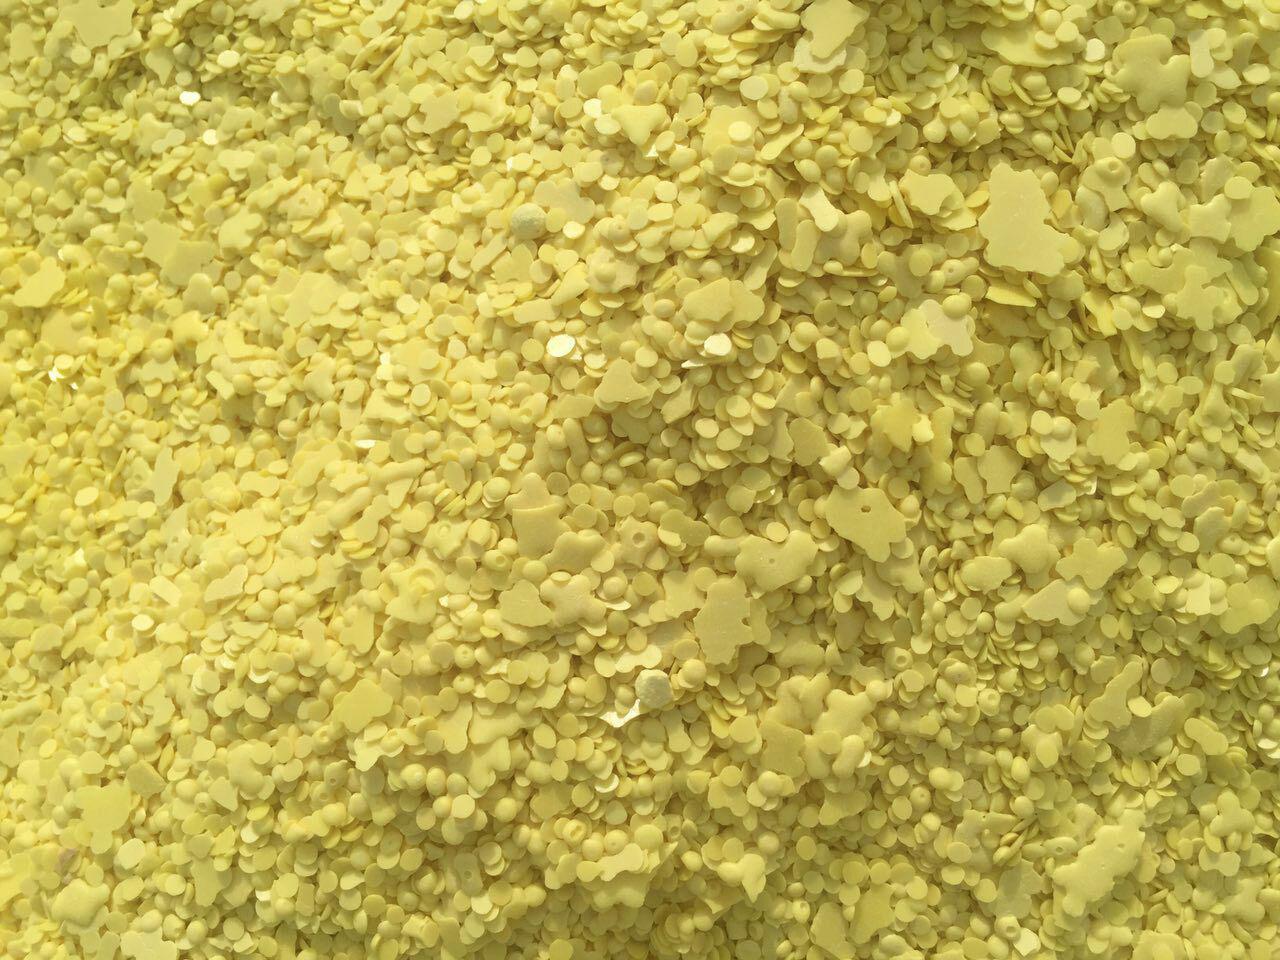 Sulphur In The Industry